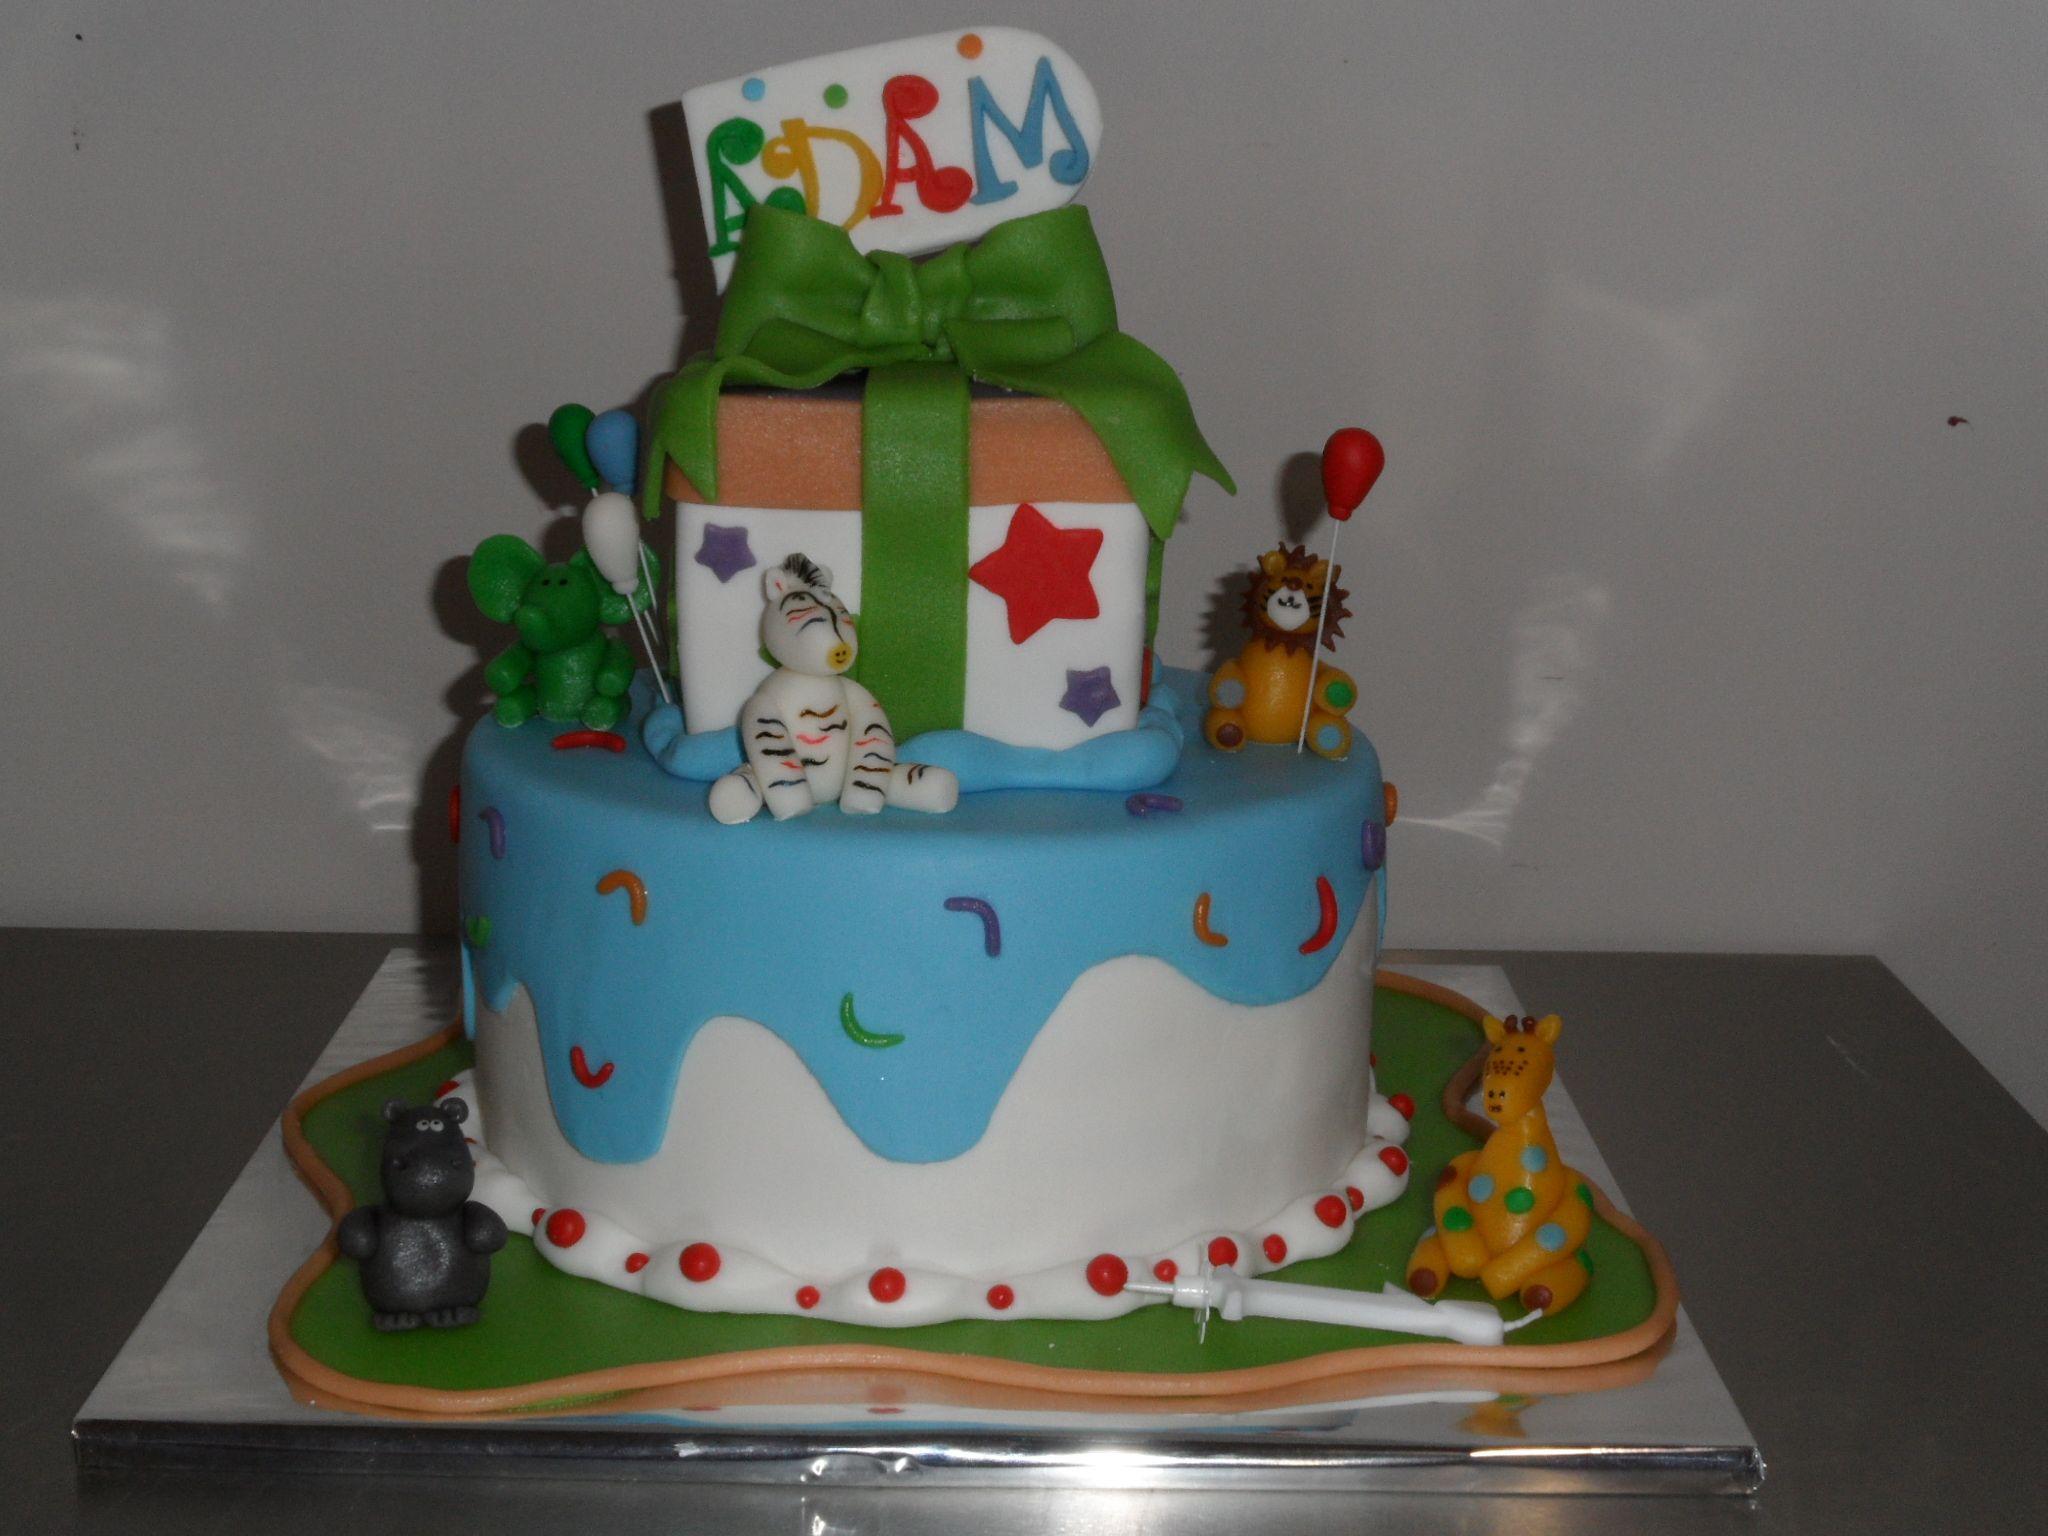 1 éves szülinapi torta 1 éves szülinapi torta | Cukrászkodás | Pinterest 1 éves szülinapi torta